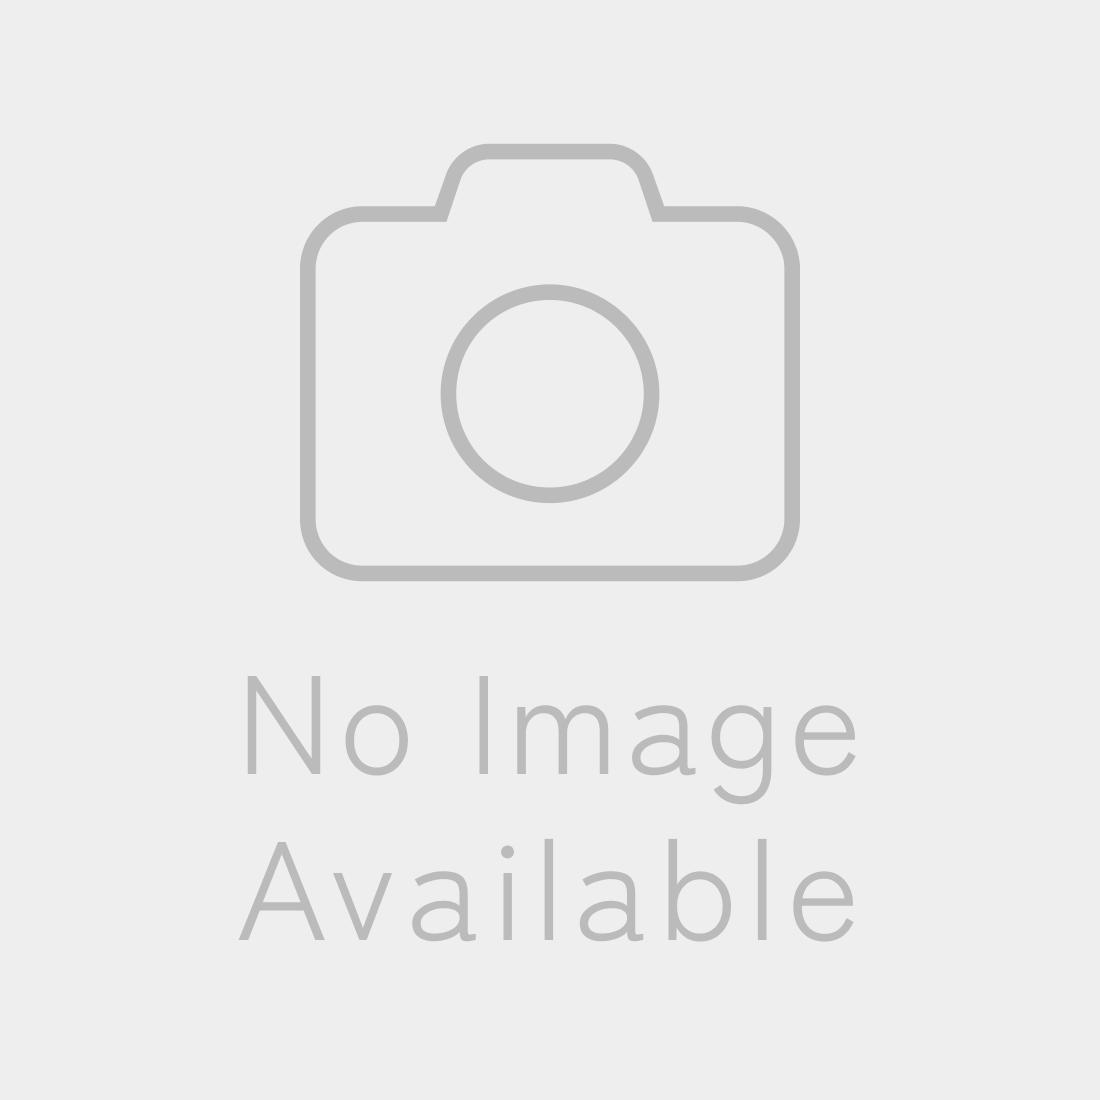 CSI82690021